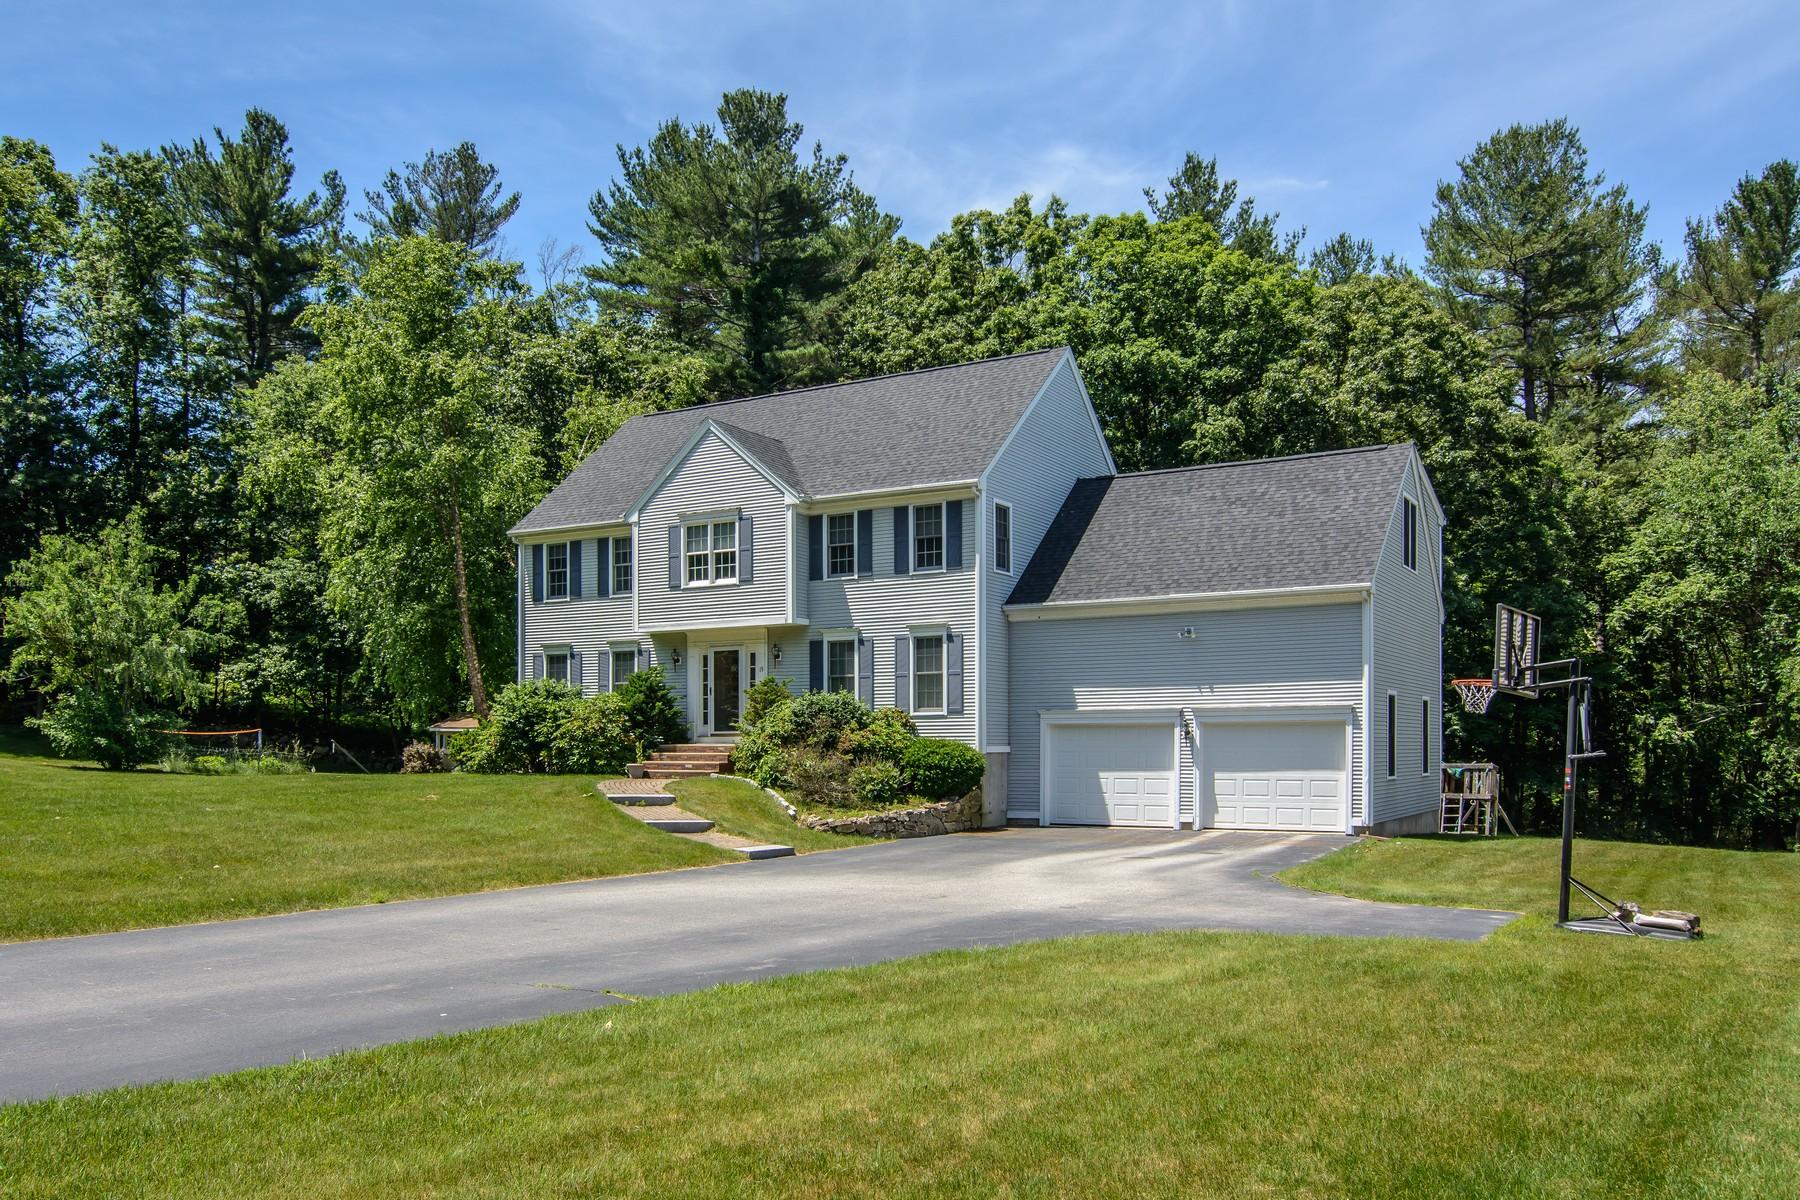 Casa Unifamiliar por un Venta en Inviting Colonial On Scenic Street 19 Belknap Street, Westborough, Massachusetts, 01581 Estados Unidos